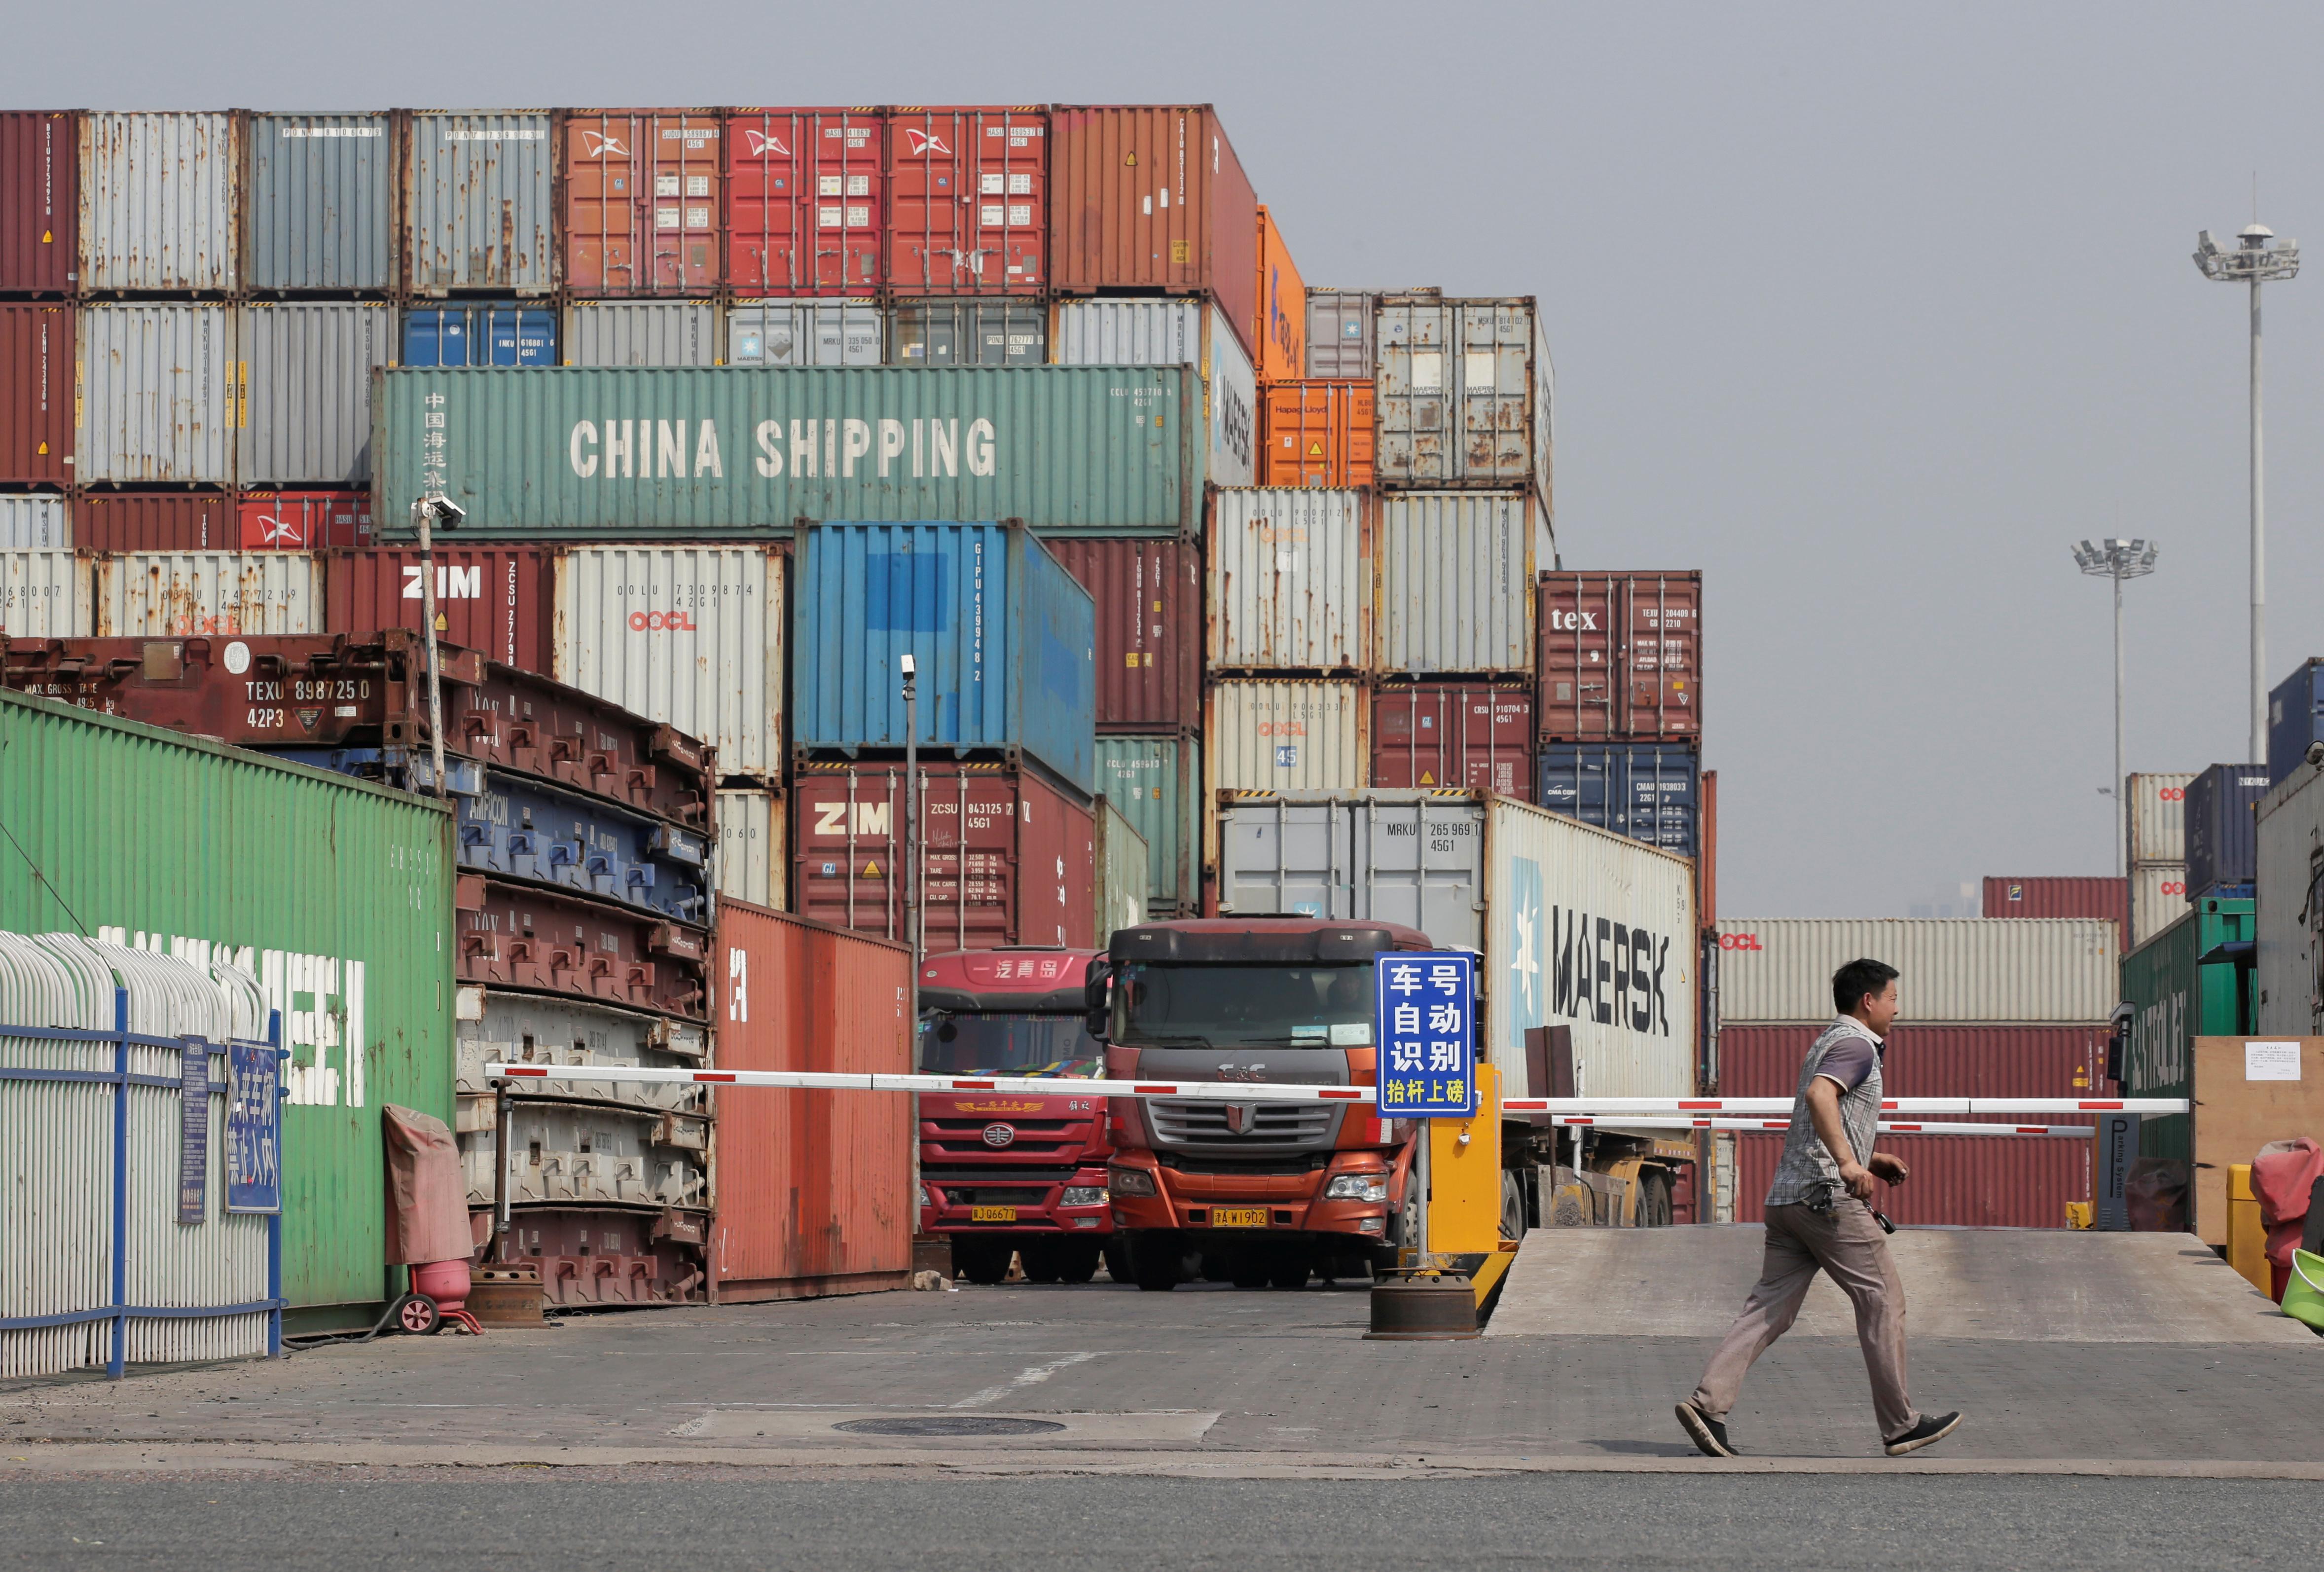 Trump to decide on $300 billion China tariffs after G20 meeting